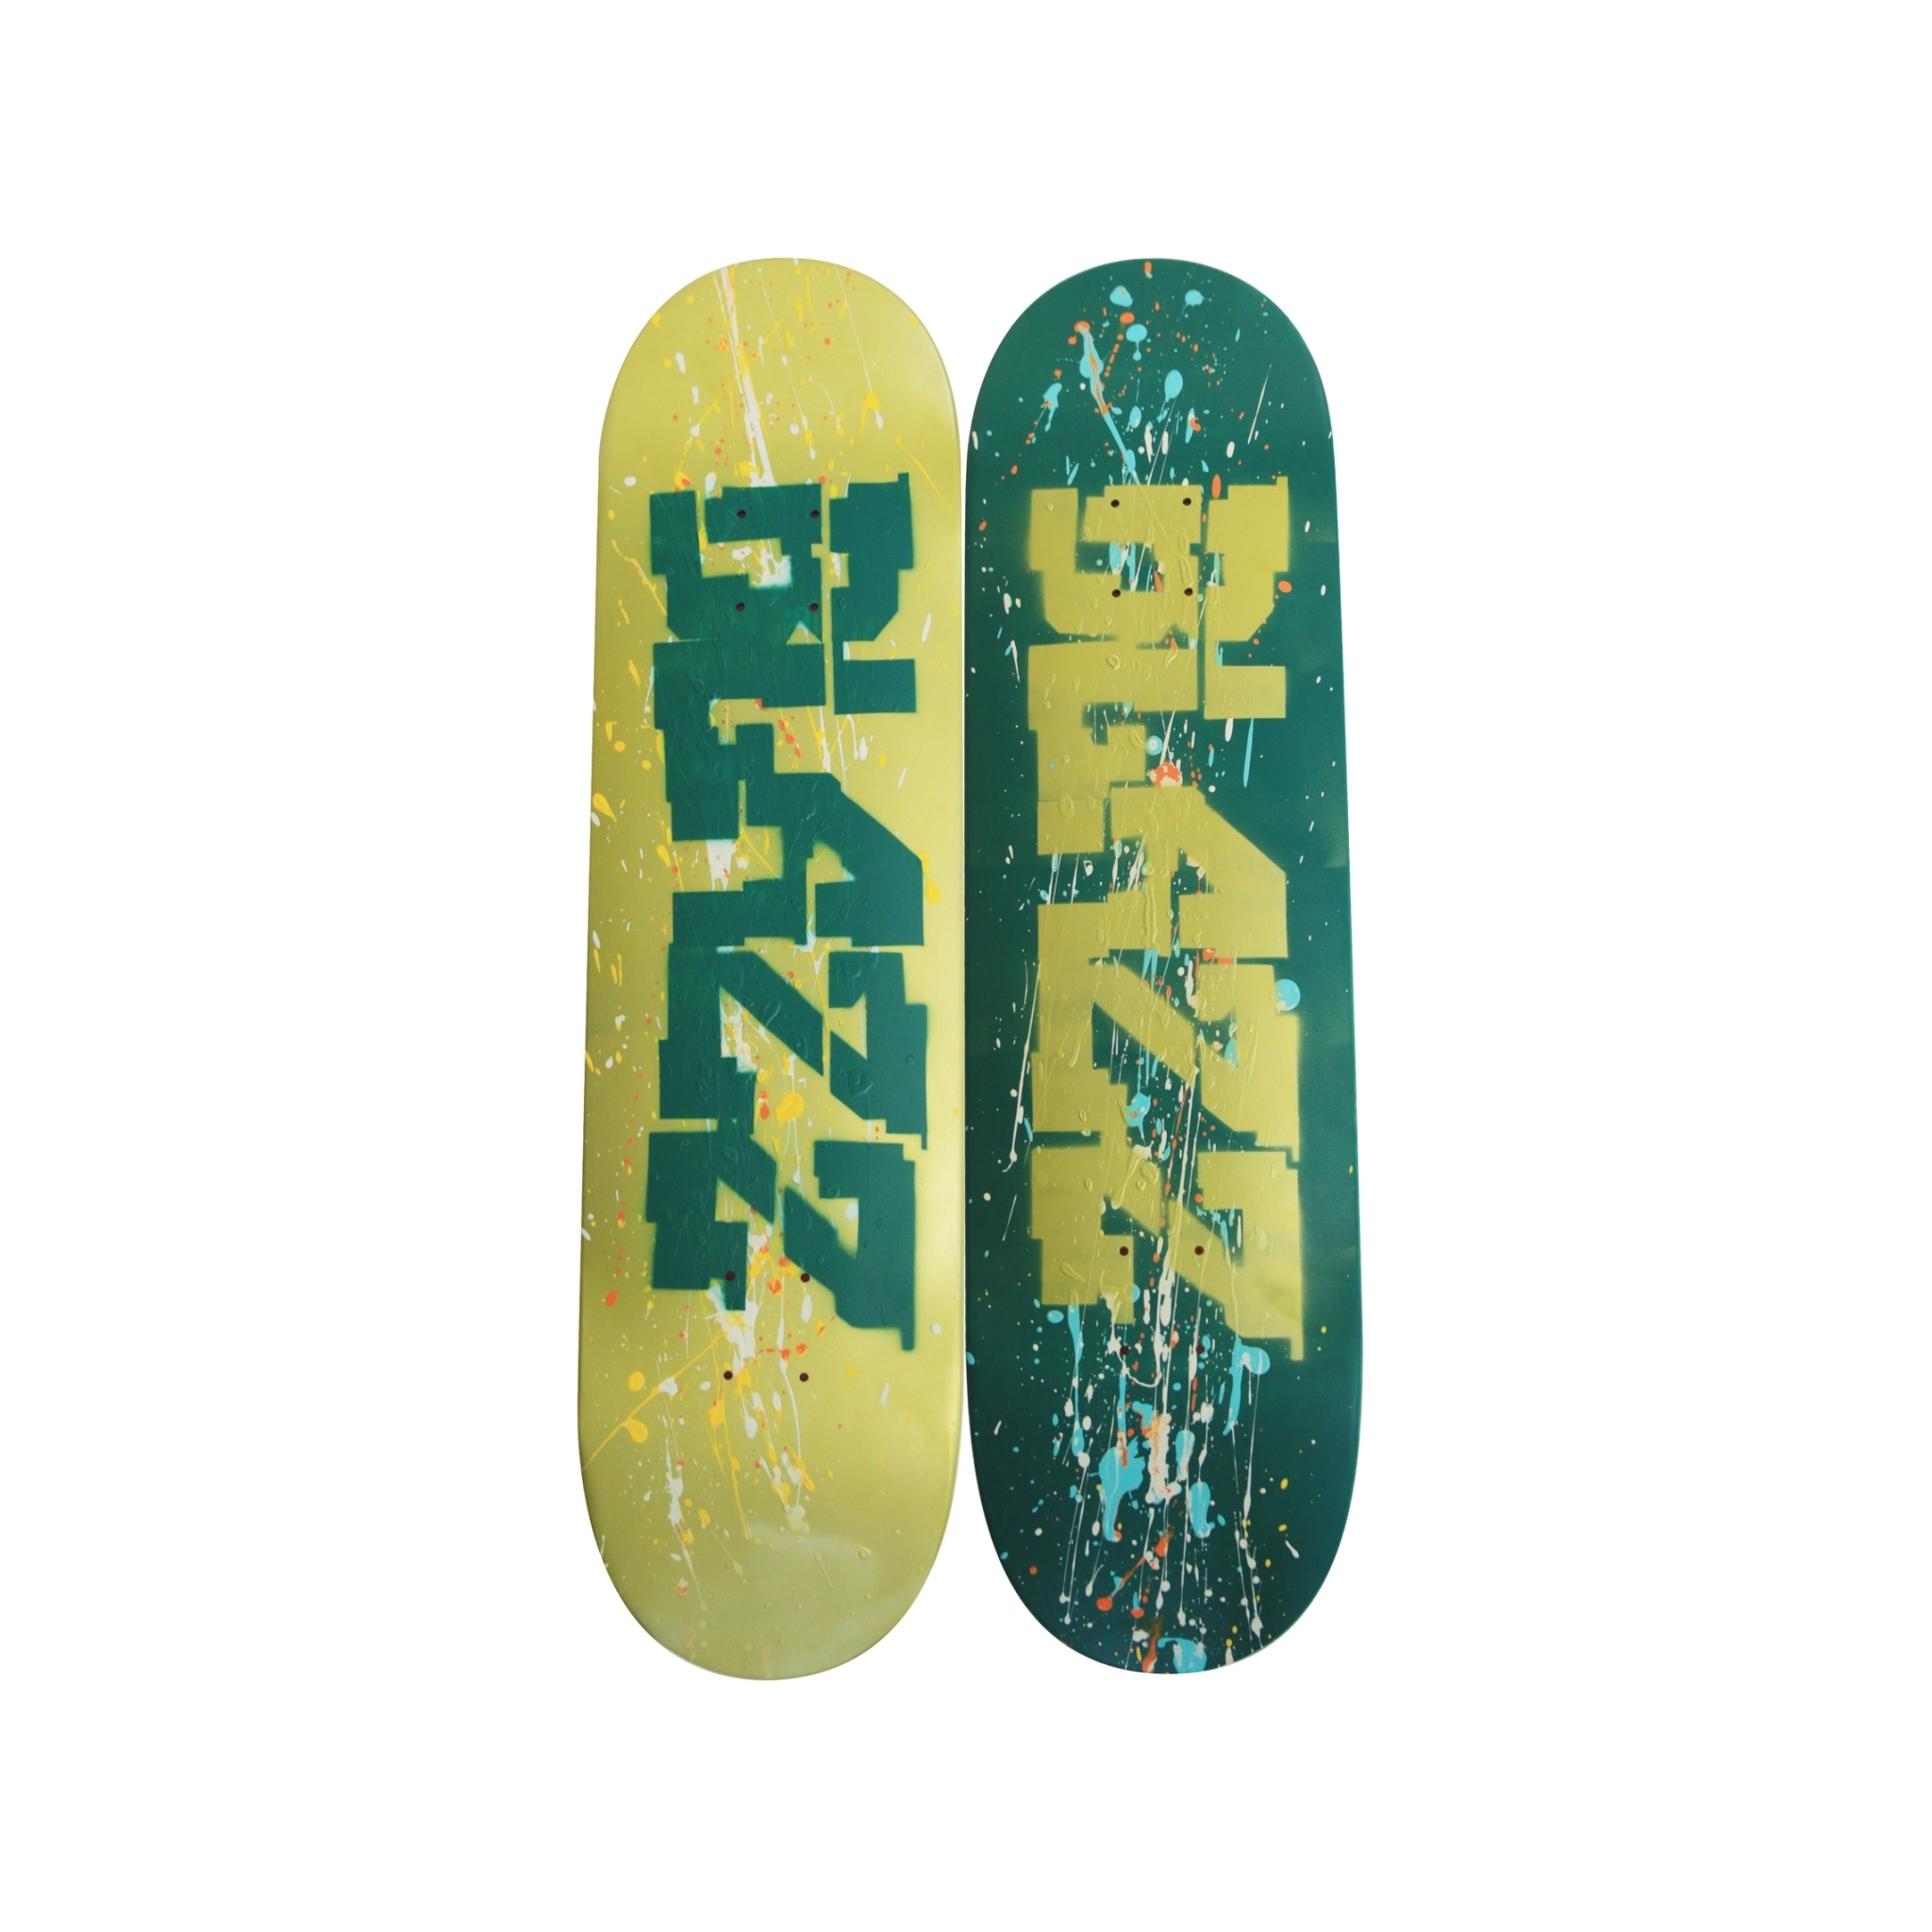 ZZSB ARTSESSION05 DECK04 (8.5) [GREEN/GOLD]